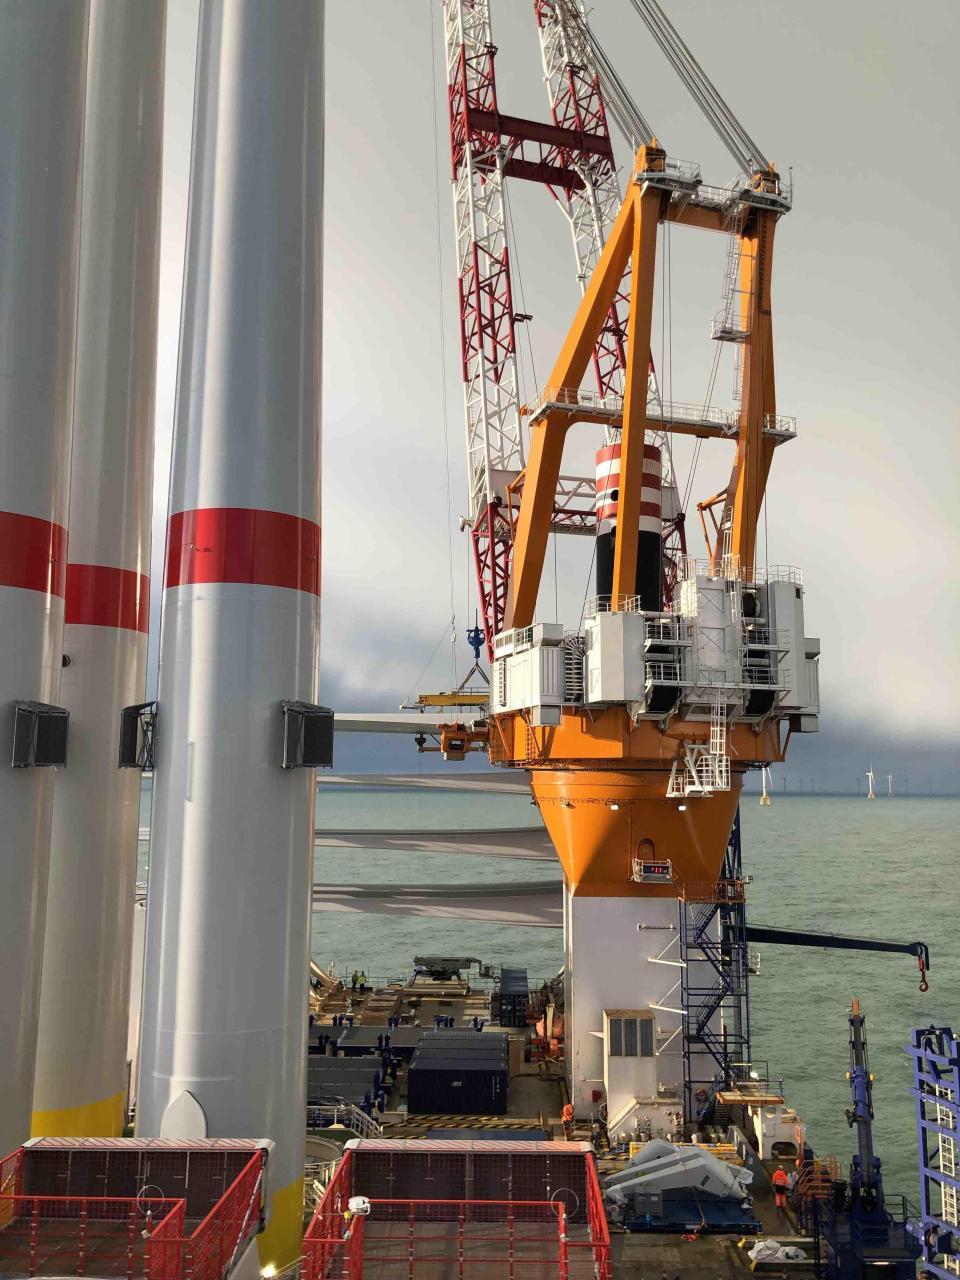 Vestas V164 8.4 MW Windturbine Installation